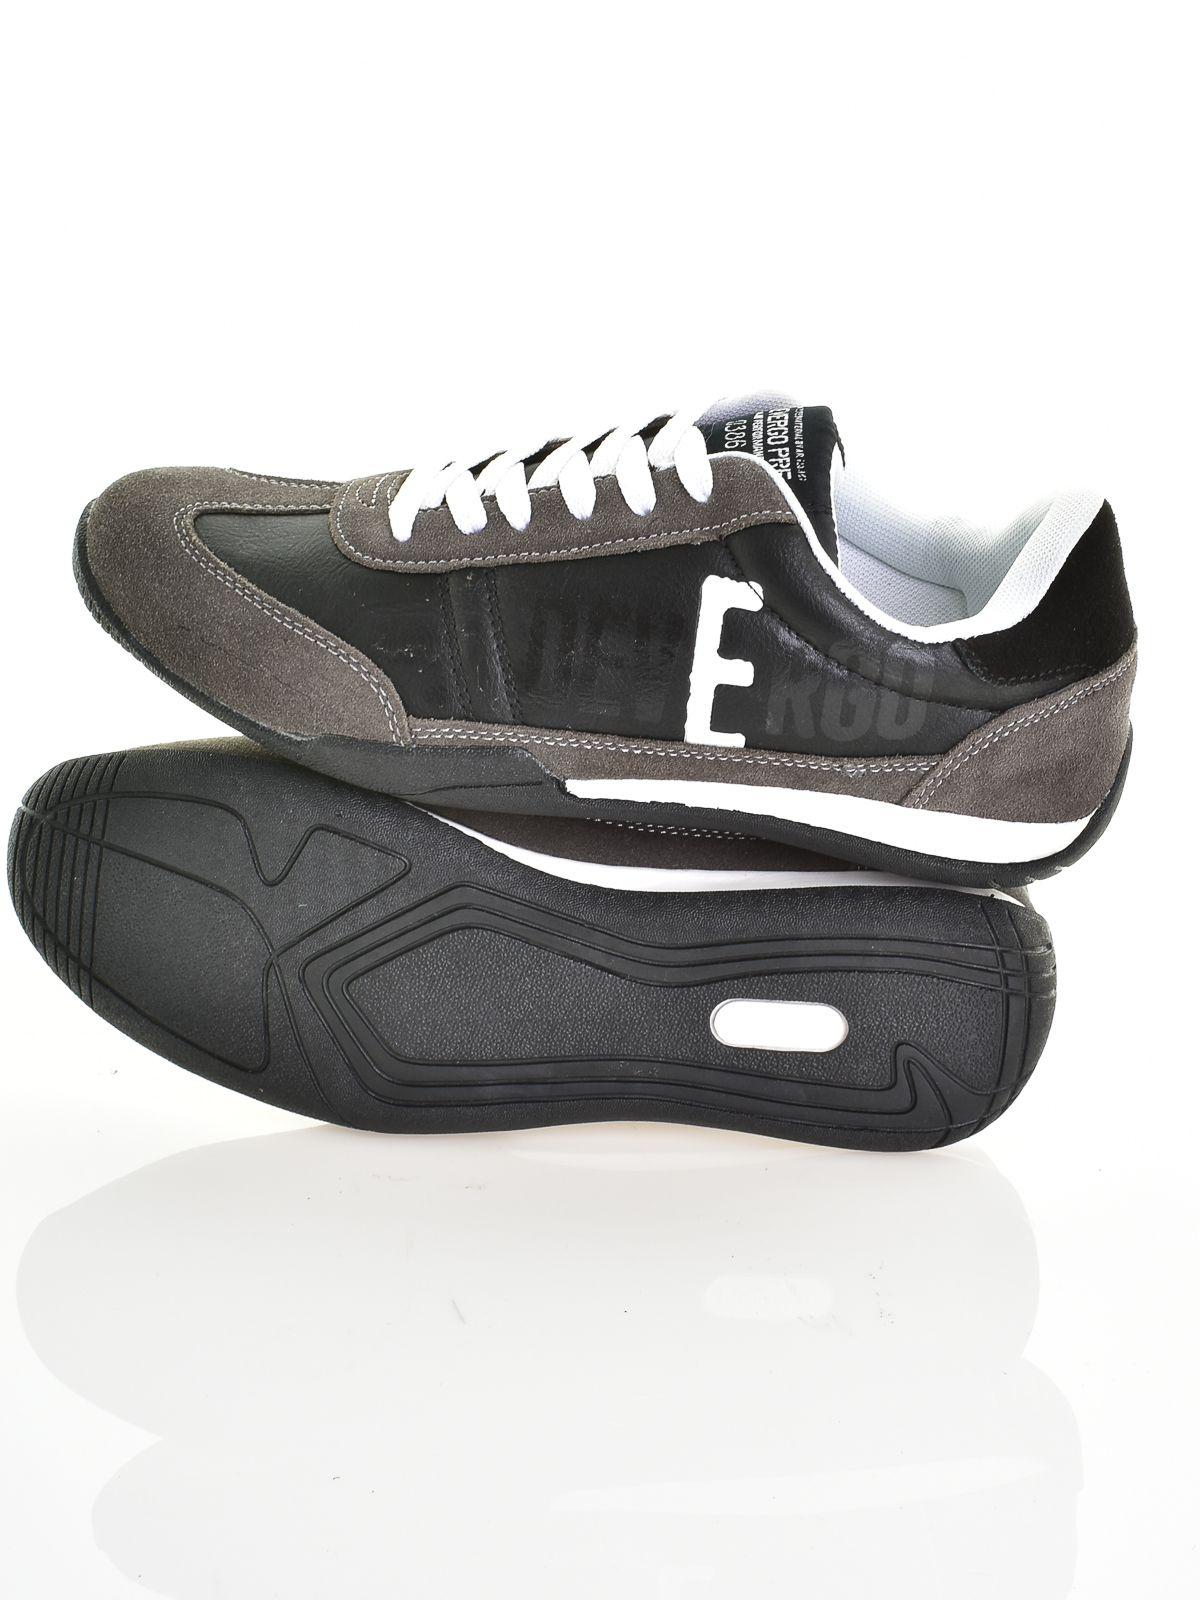 ... Devergo férfi cipő DIMITRIS MOD ... 6bbfb05aba